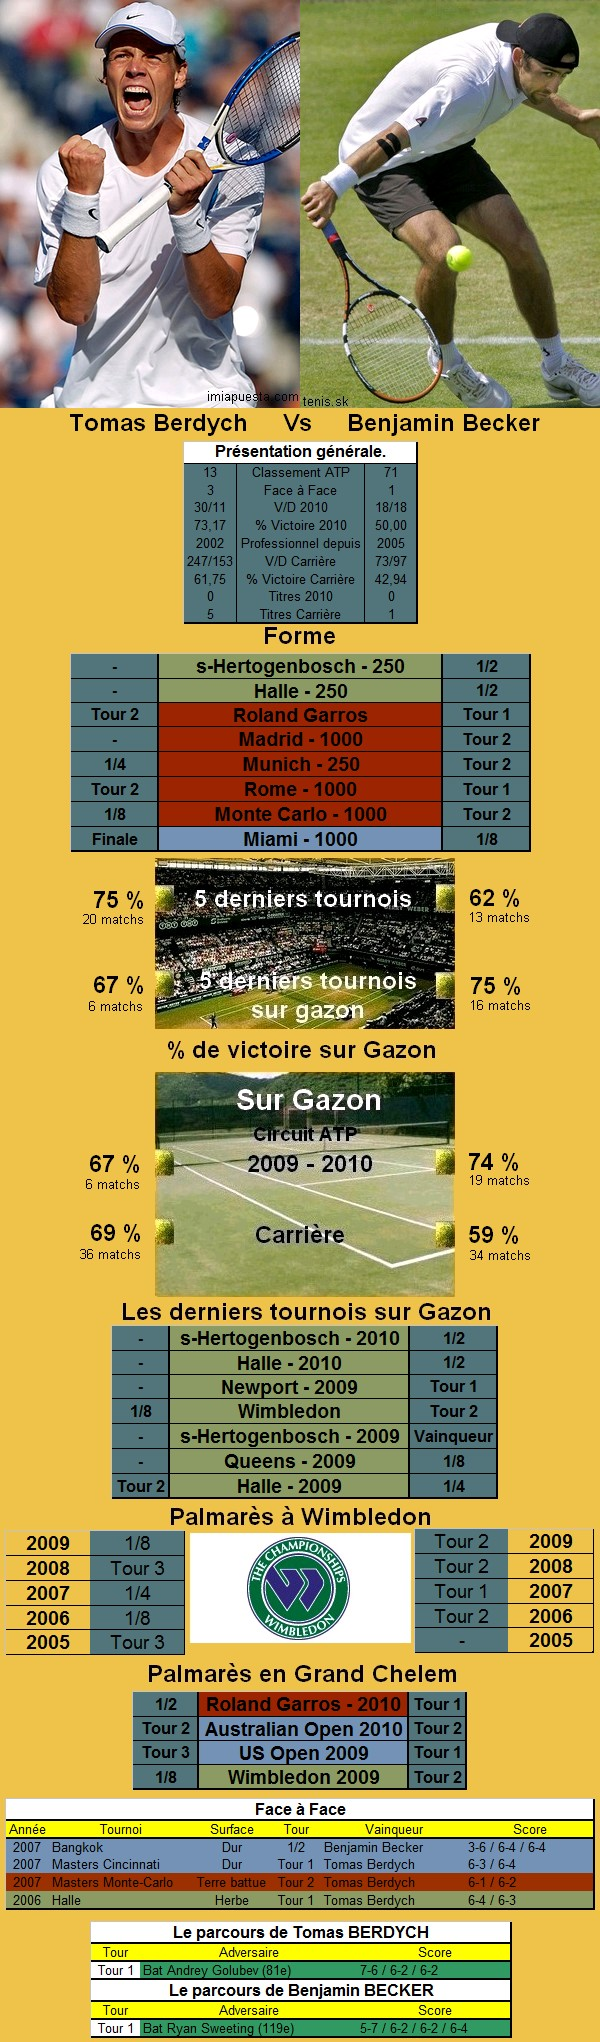 Statistiques tennis de Berdych contre Becker à Wimbledon